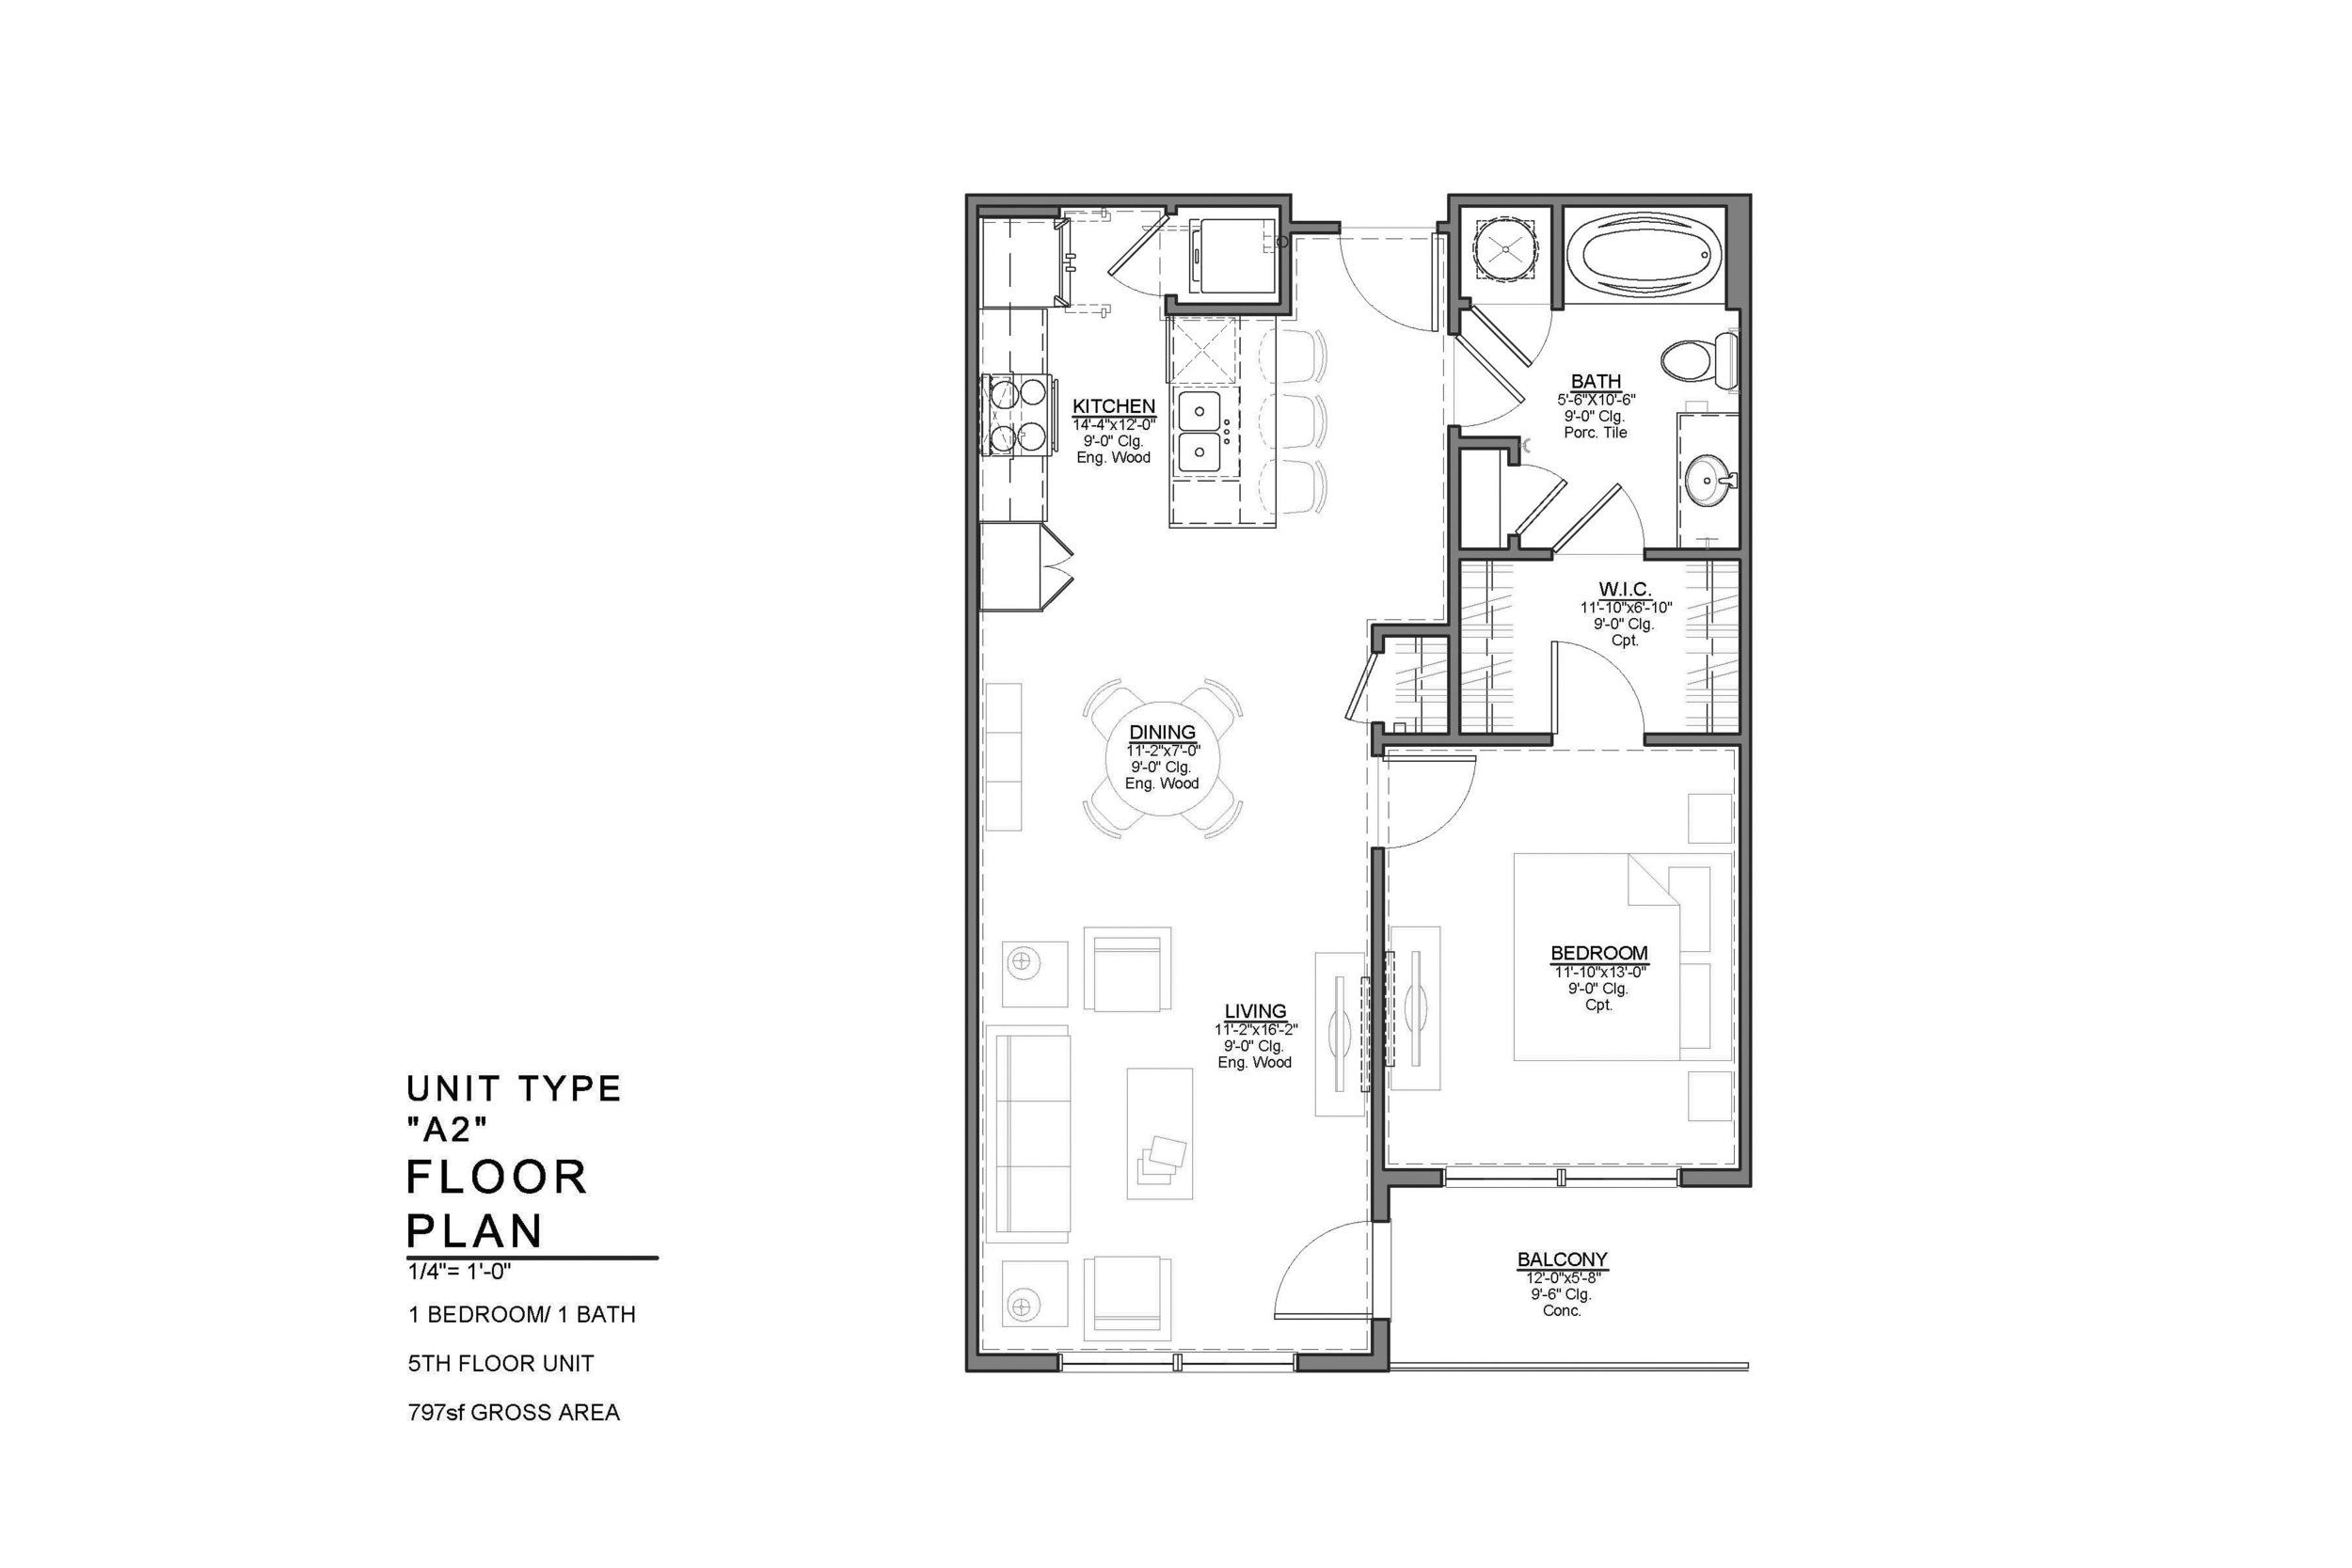 A2 FLOOR PLAN: 1 BEDROOM / 1 BATH